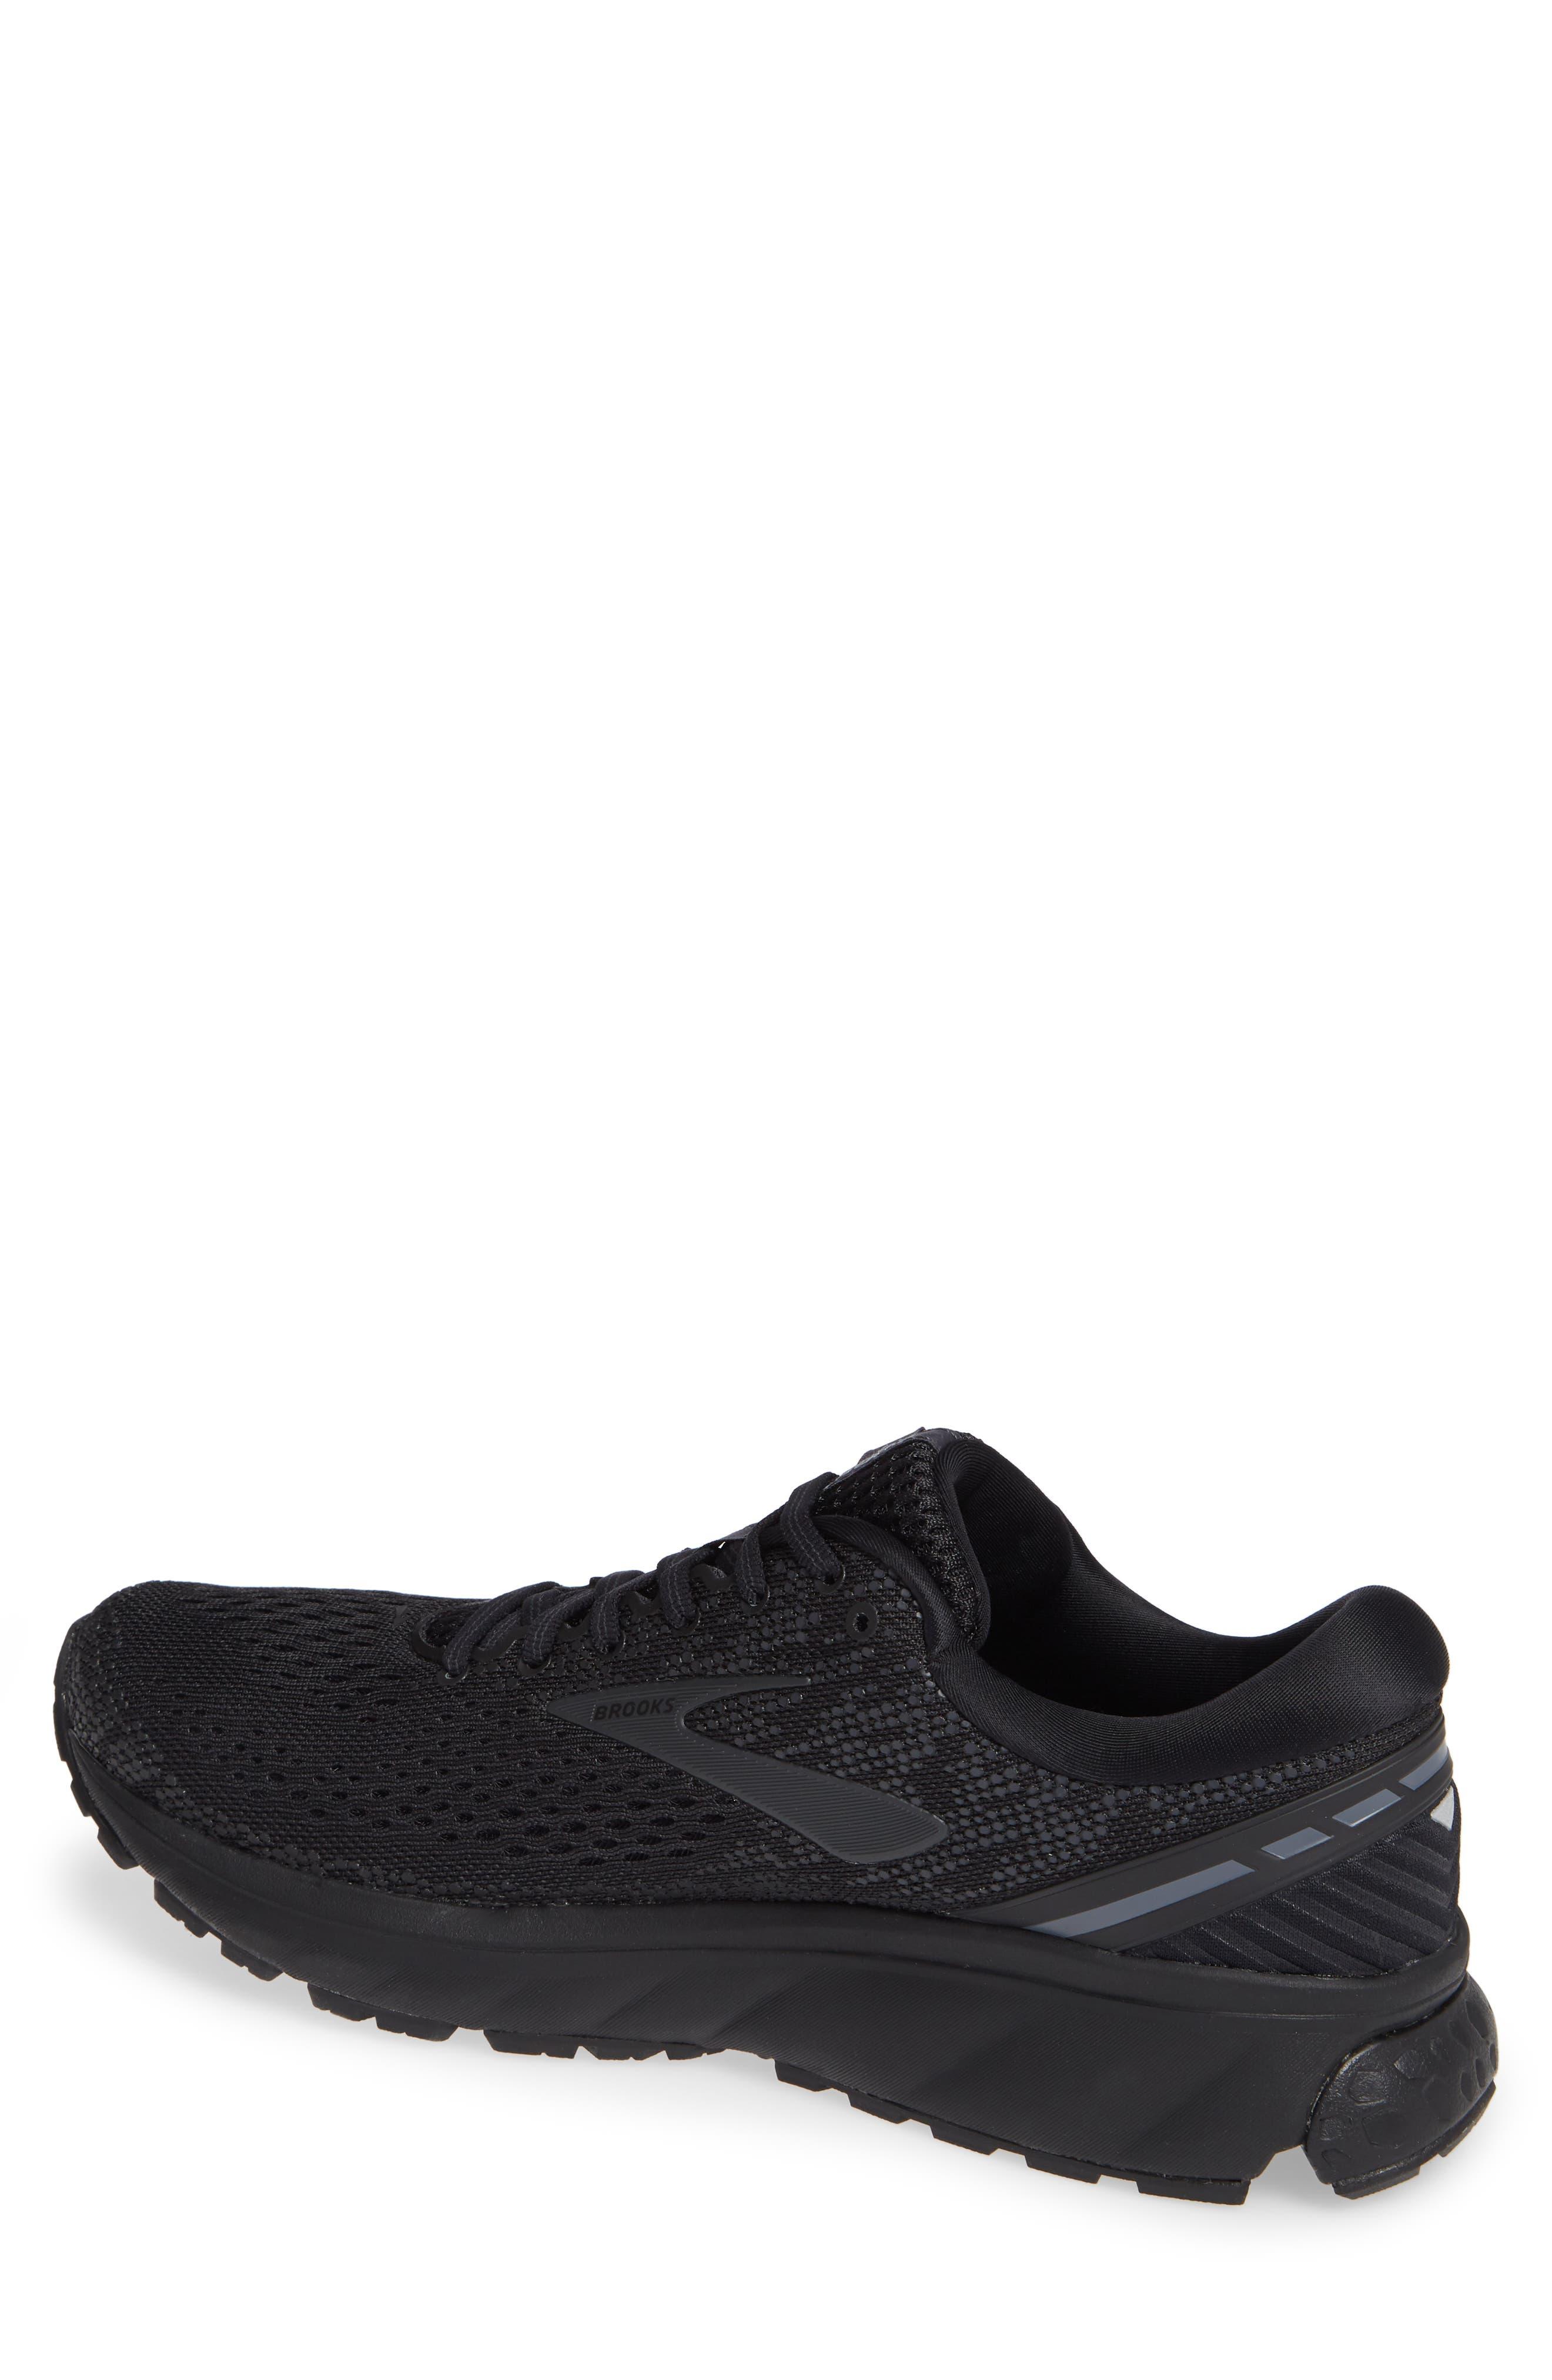 Ghost 11 Running Shoe,                             Alternate thumbnail 2, color,                             BLACK/ EBONY